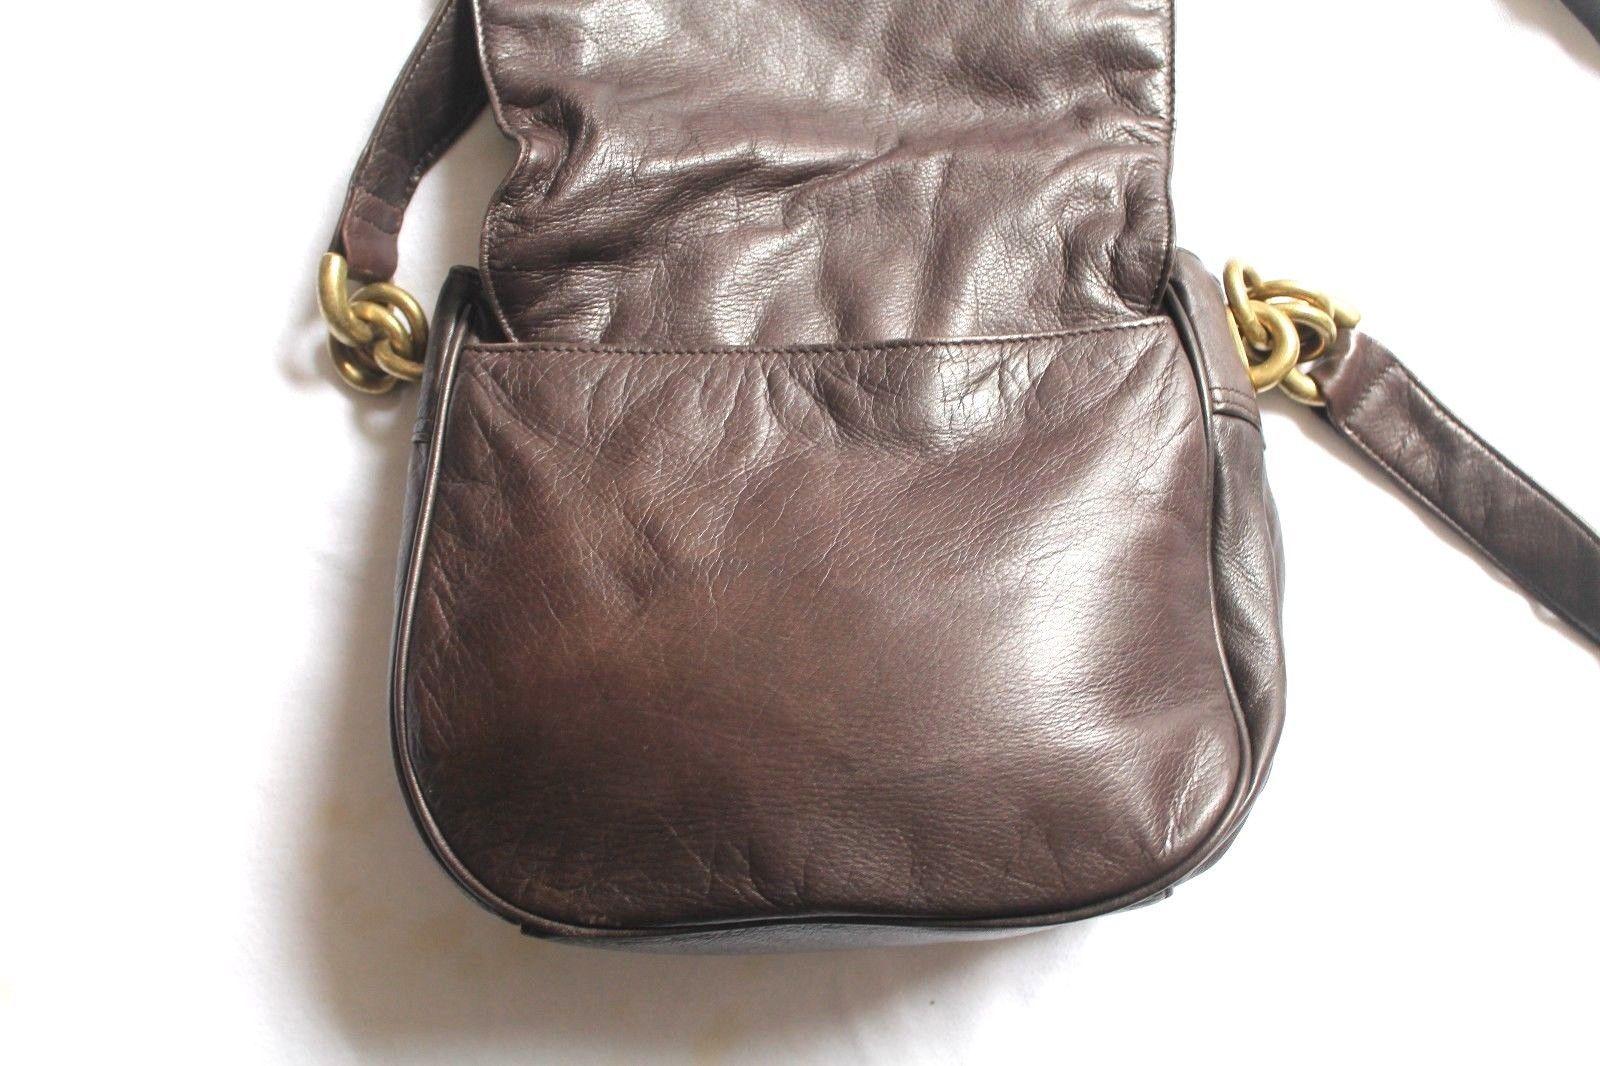 DKNY Chocolate Brown Leather Hobo Crossbodybag handbag Donna Karen